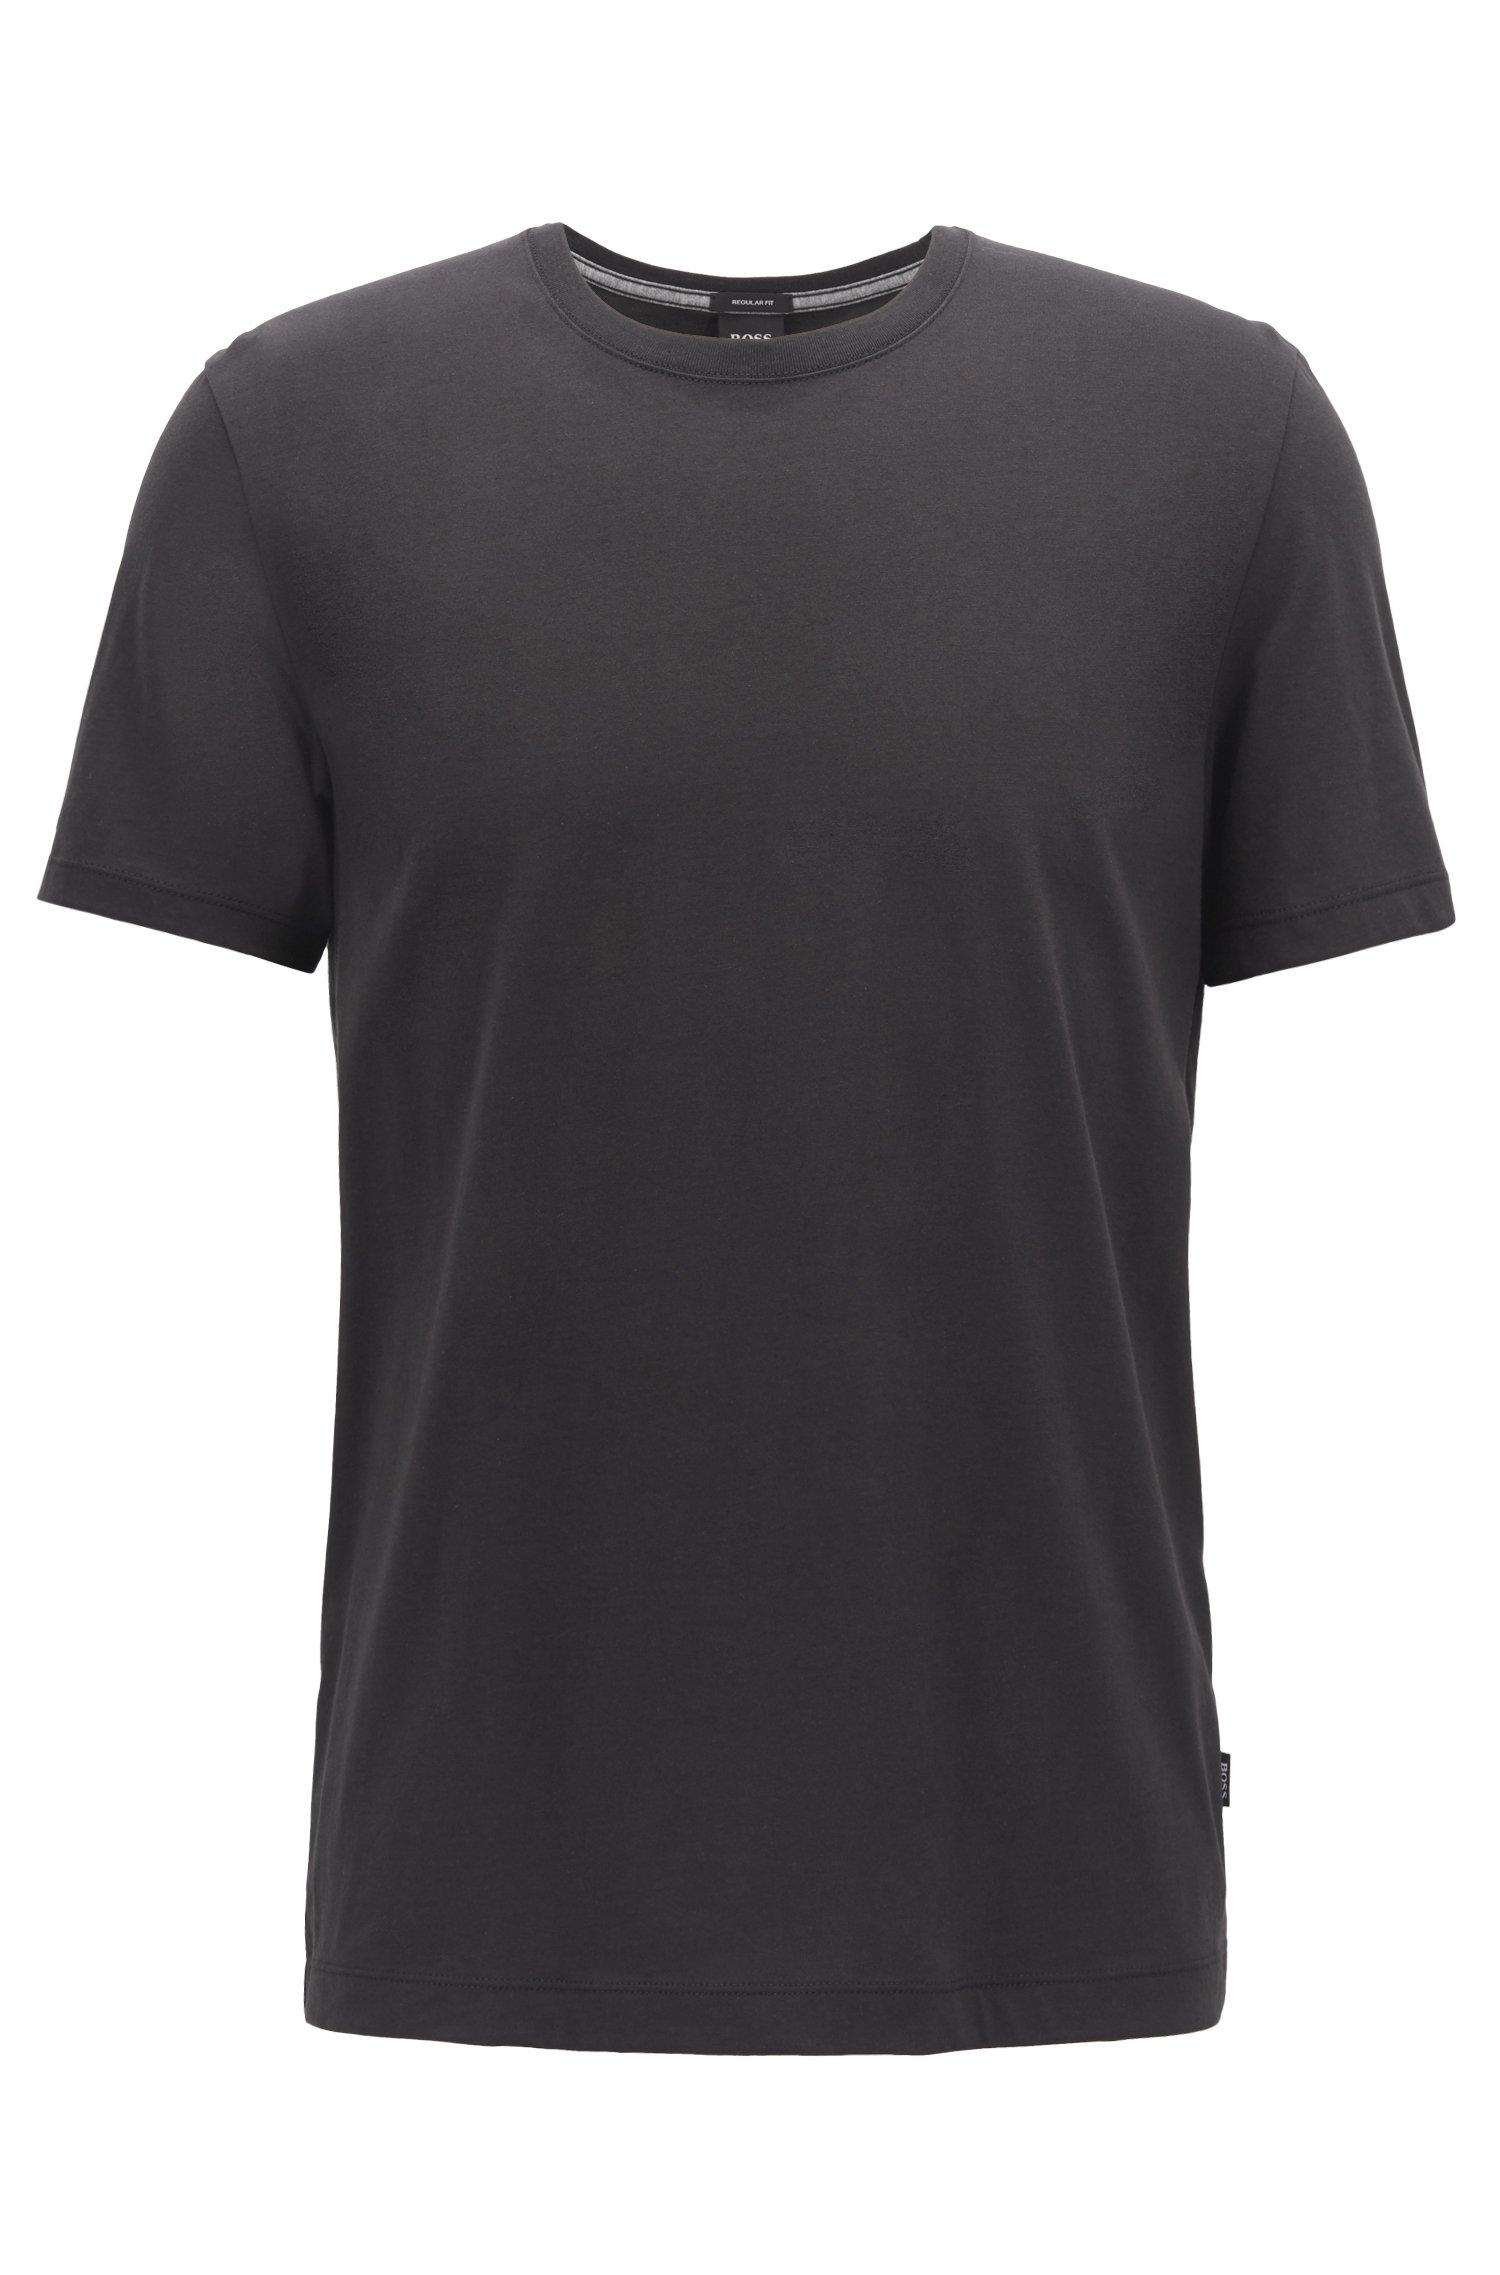 T-shirt regular fit in morbido cotone. Hugo Boss HUGO BOSS | T-shirt | 50379310001